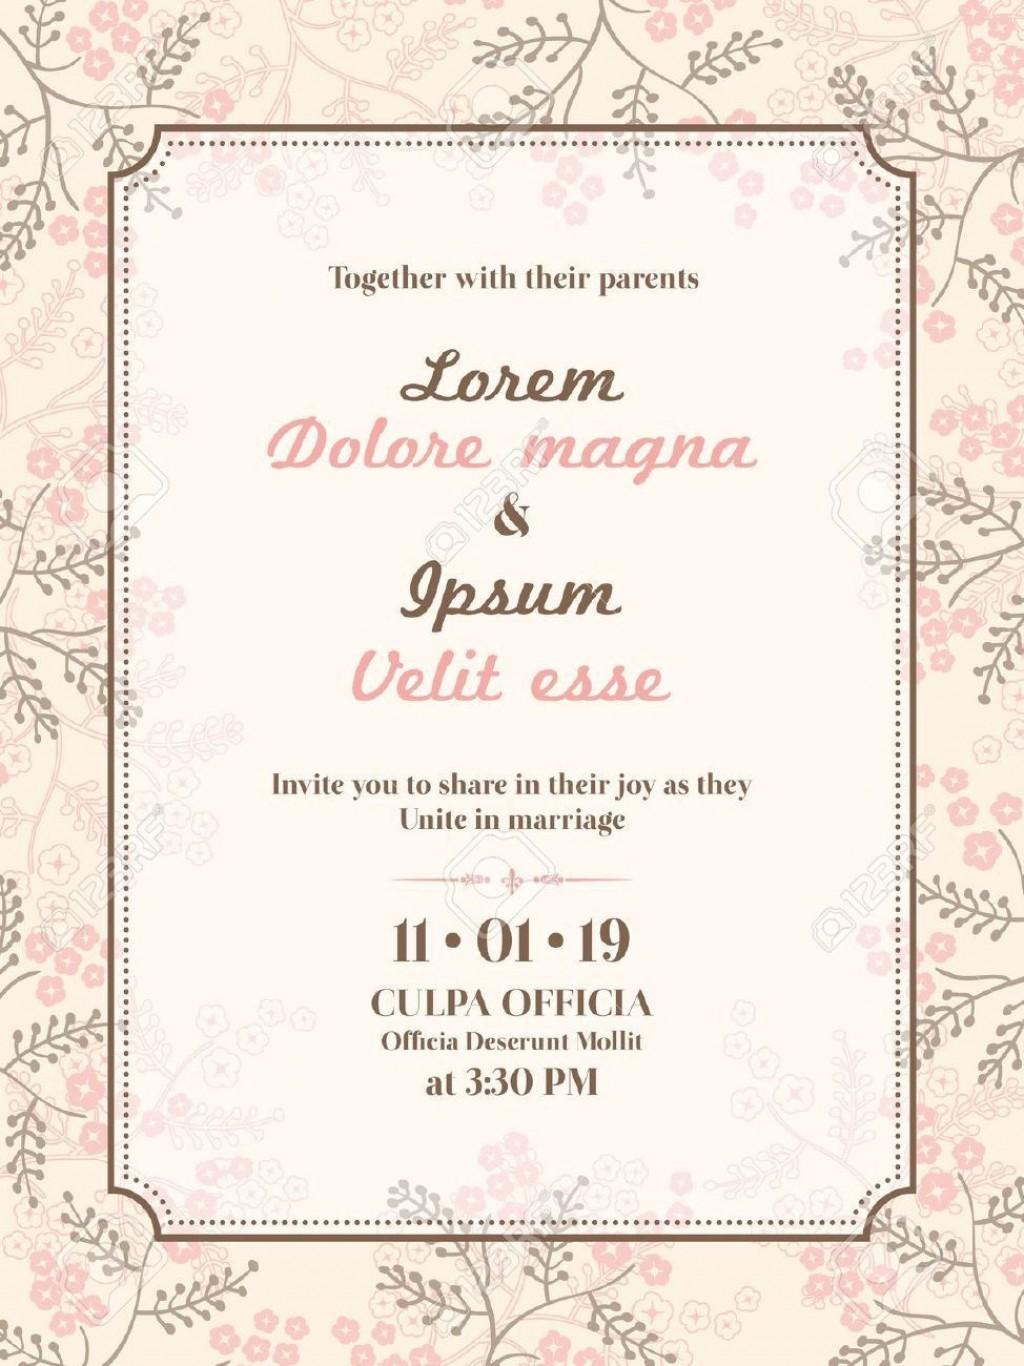 000 Top Sample Wedding Invitation Maker High Resolution Large